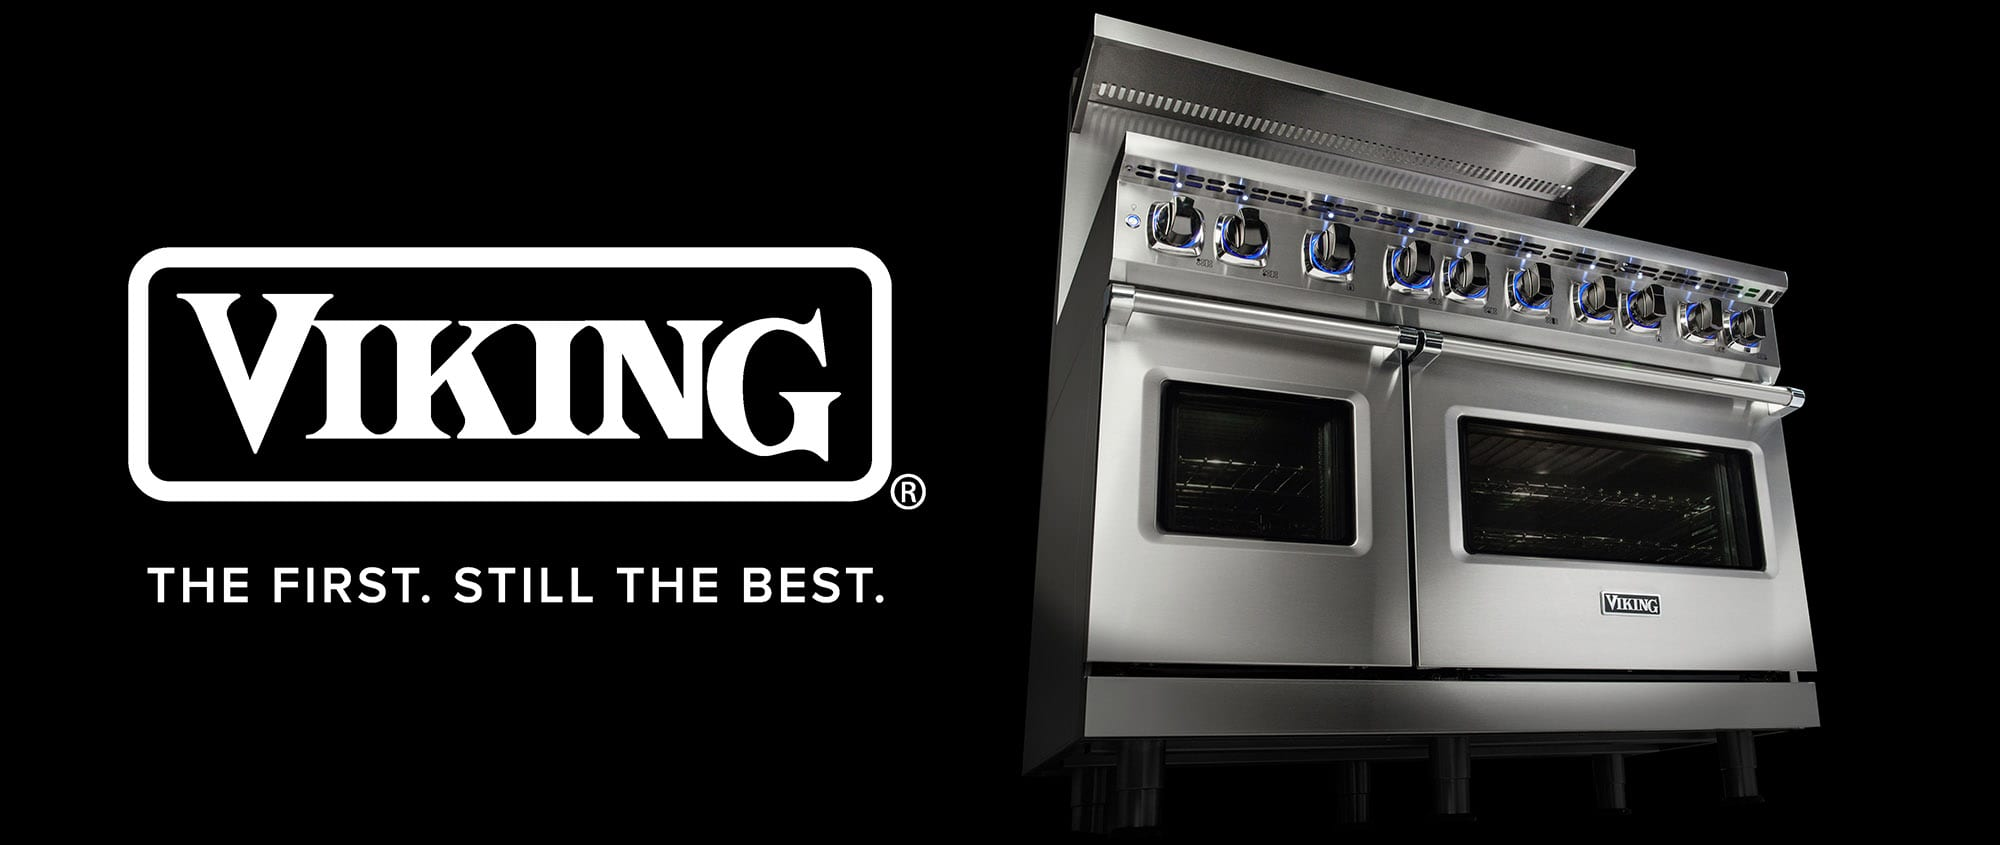 Viking Appliances University Electric